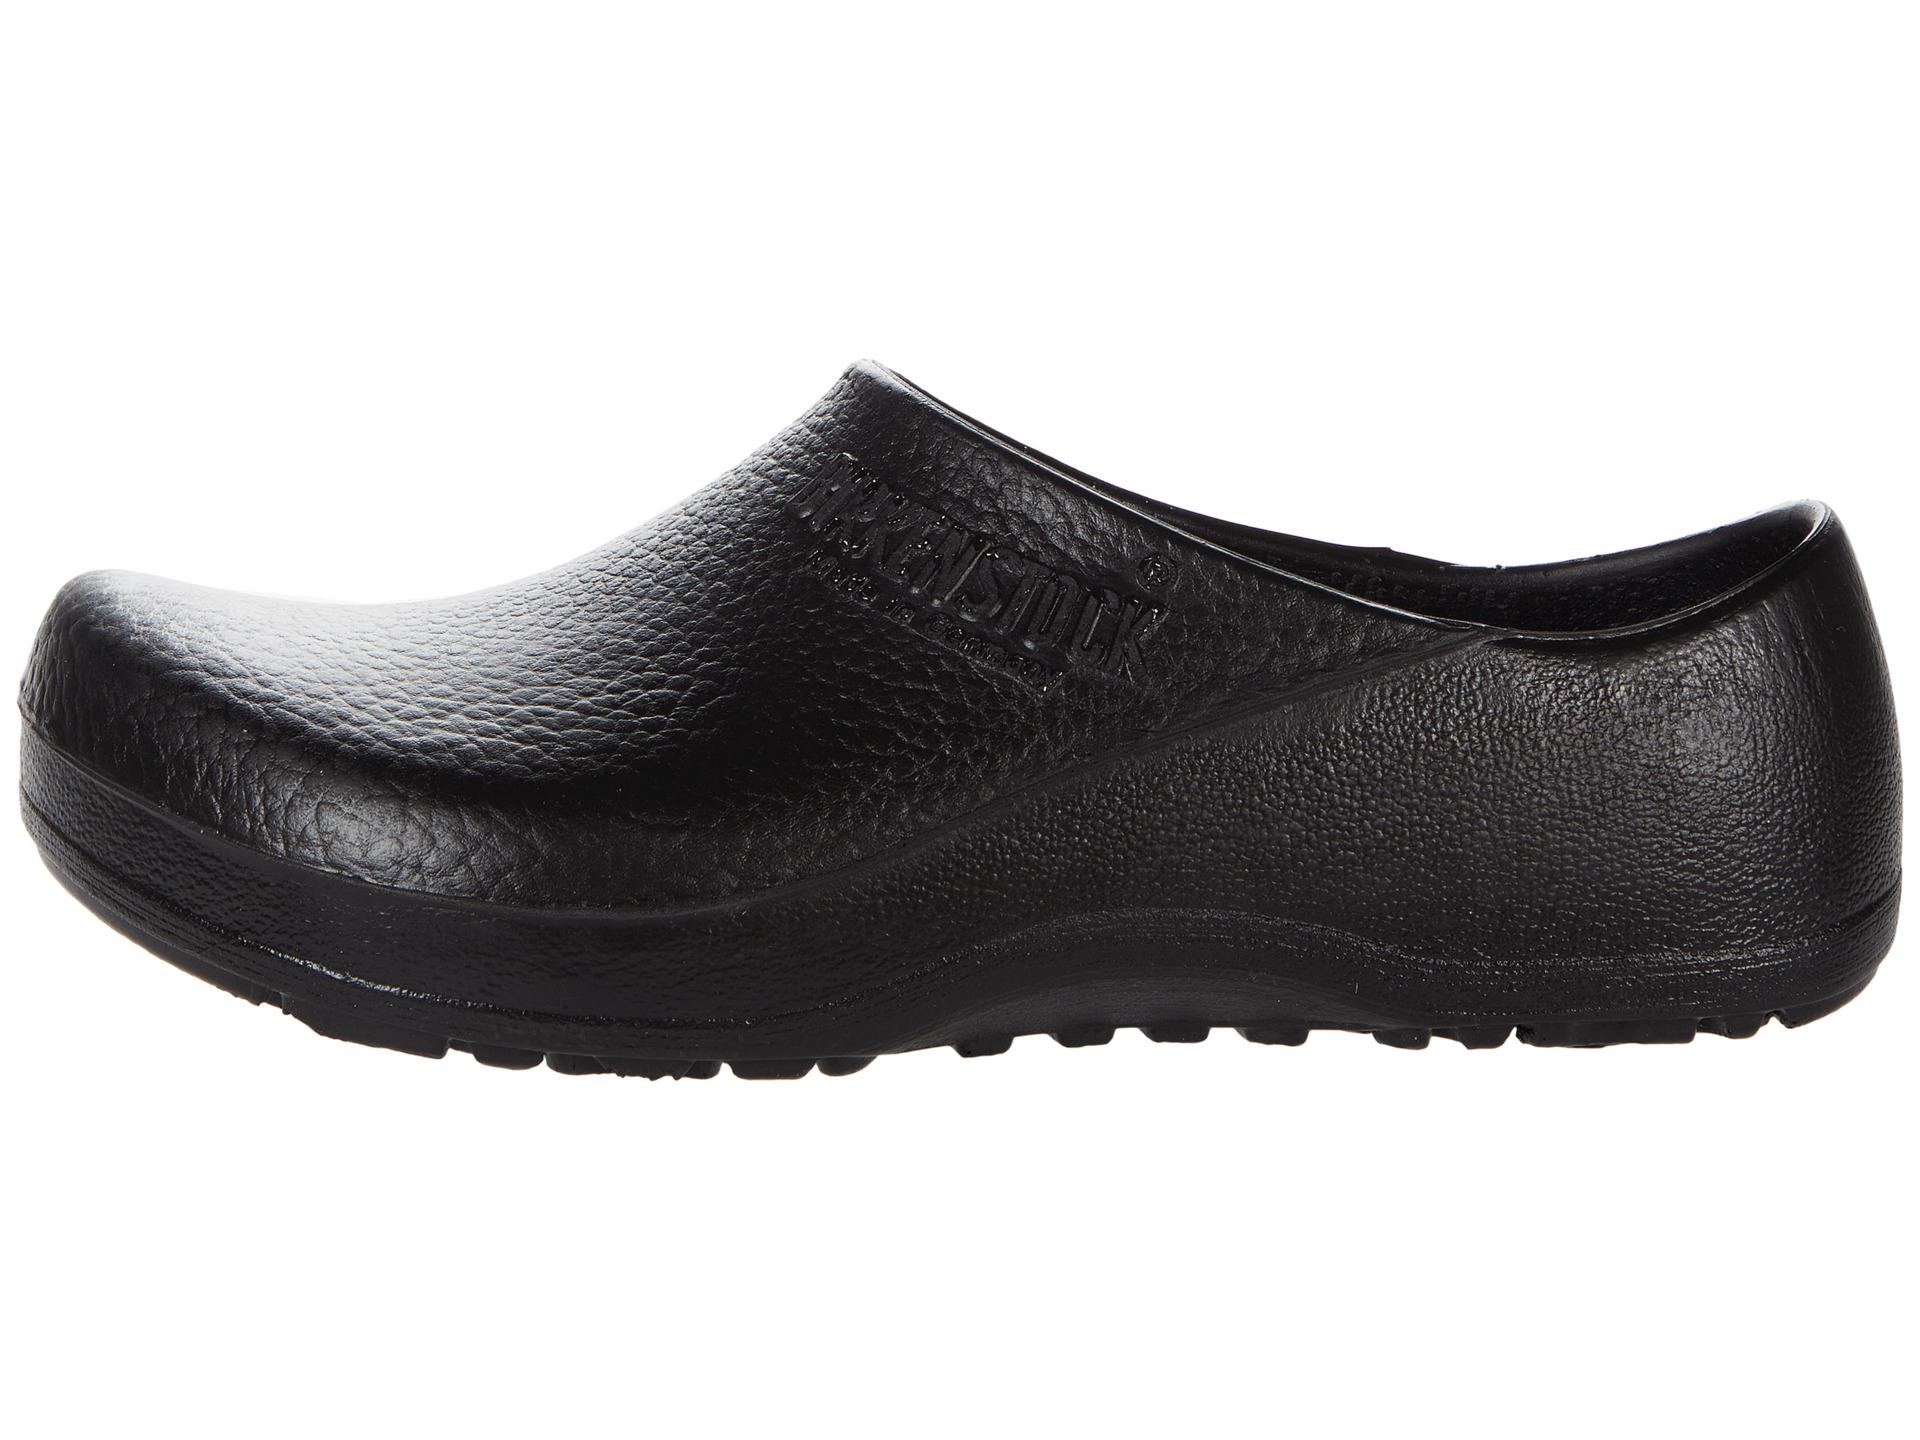 birkenstock professional clogs black